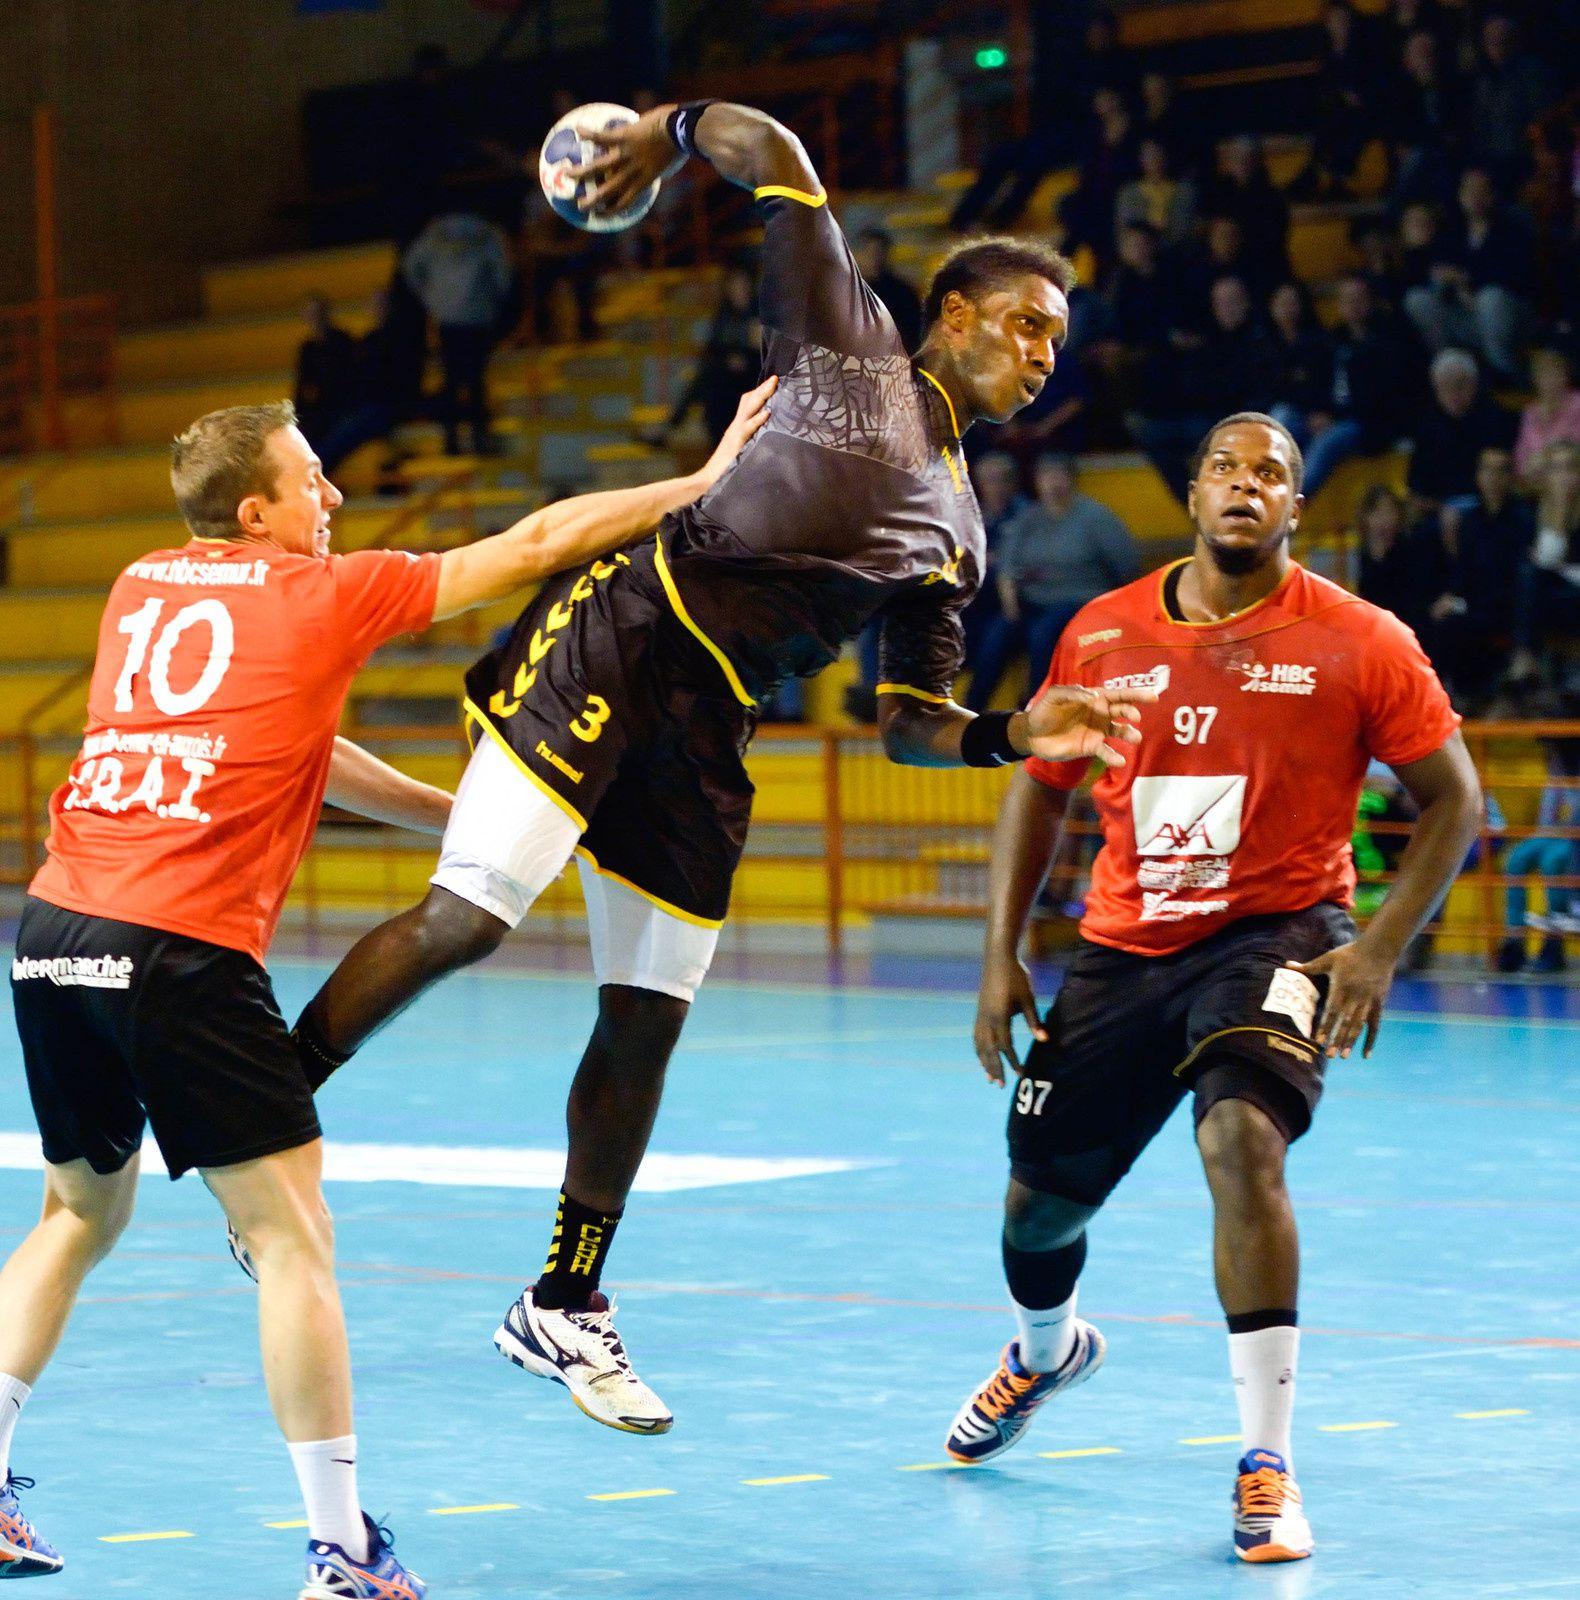 Photos : Jean Pierre RIBOLI / Jean Jaures le 8 novembre 2014